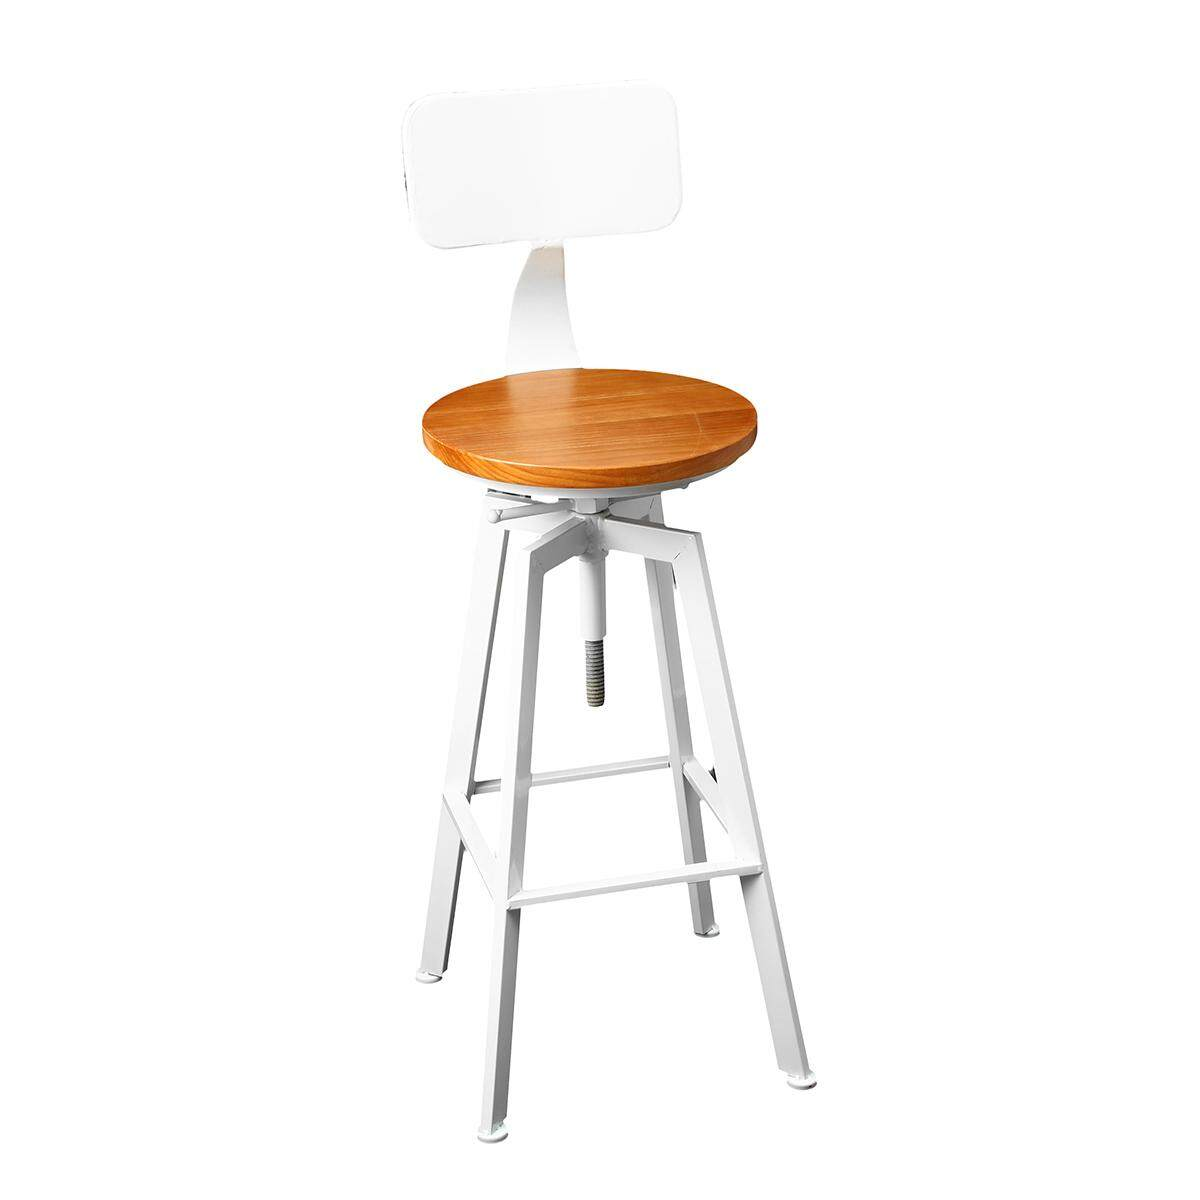 European Bar Stool Chair Lift Chair Rotating Bar Chair Simple Home Backrest High Stool Cashier Chair 2019 Latest Style Online Sale 50% Bar Furniture Furniture